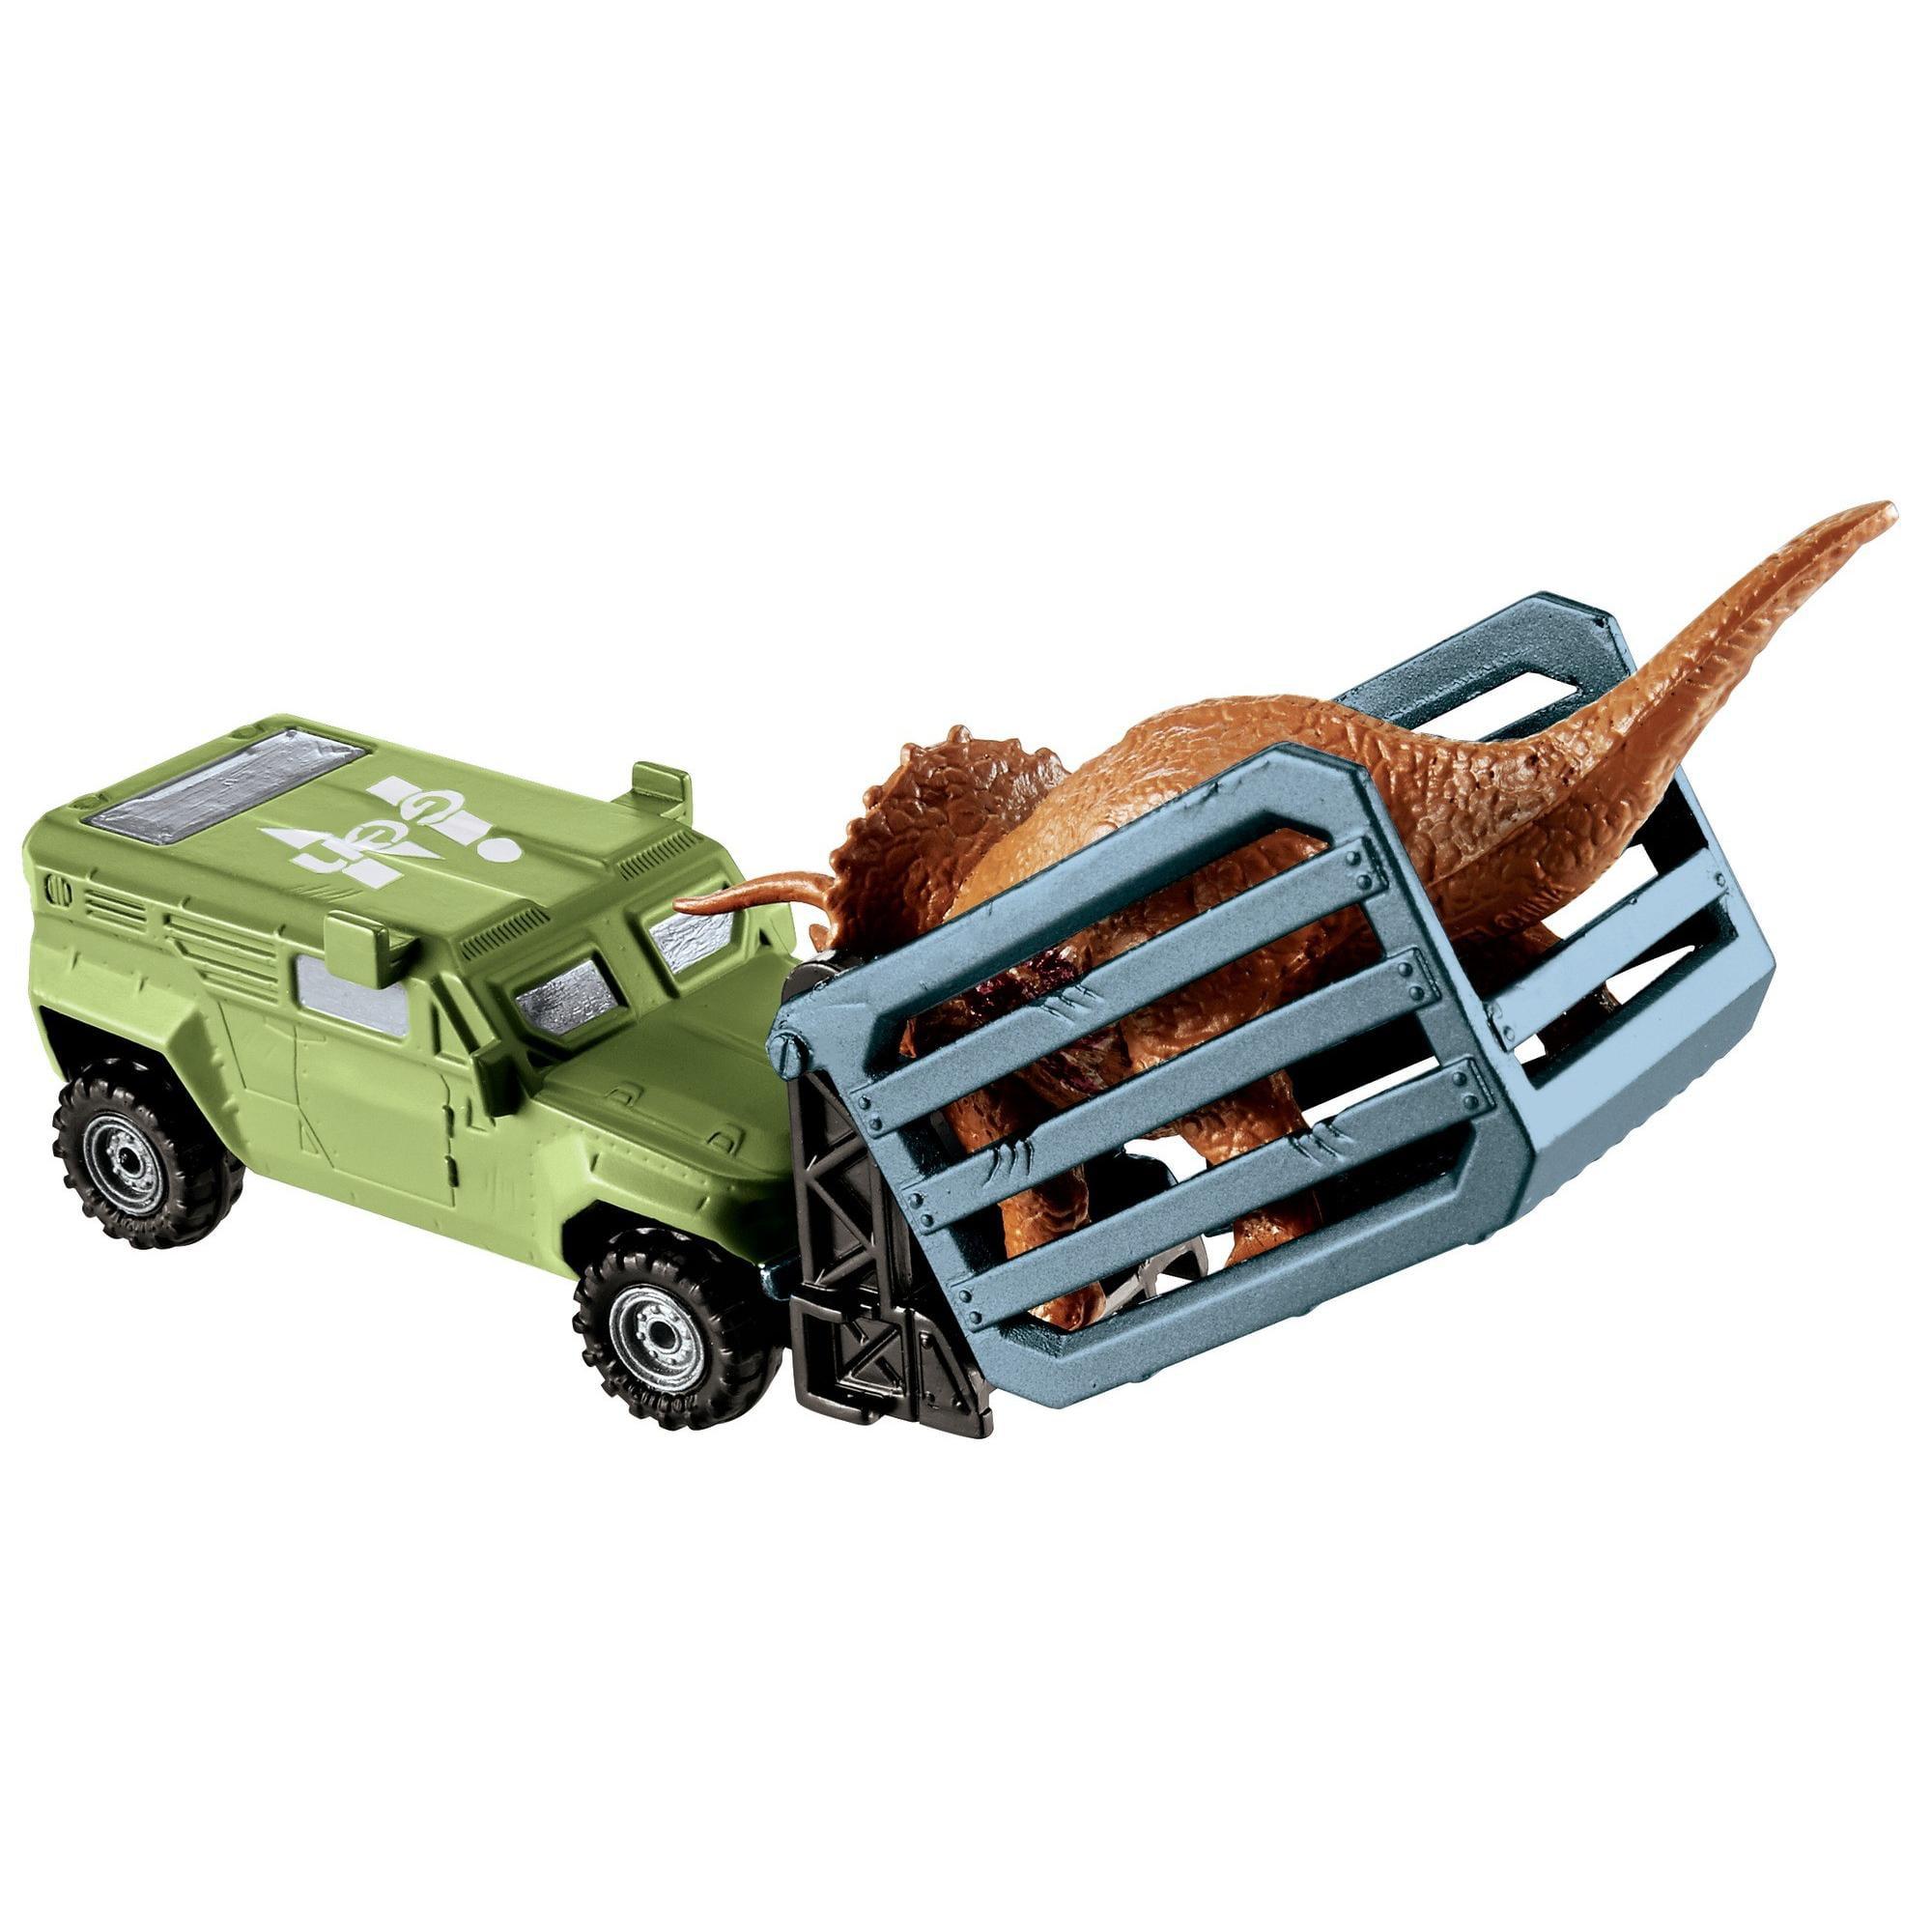 Matchbox Jurassic World Dino Transporters Tricera-tracker Vehicle and Figure by Mattel